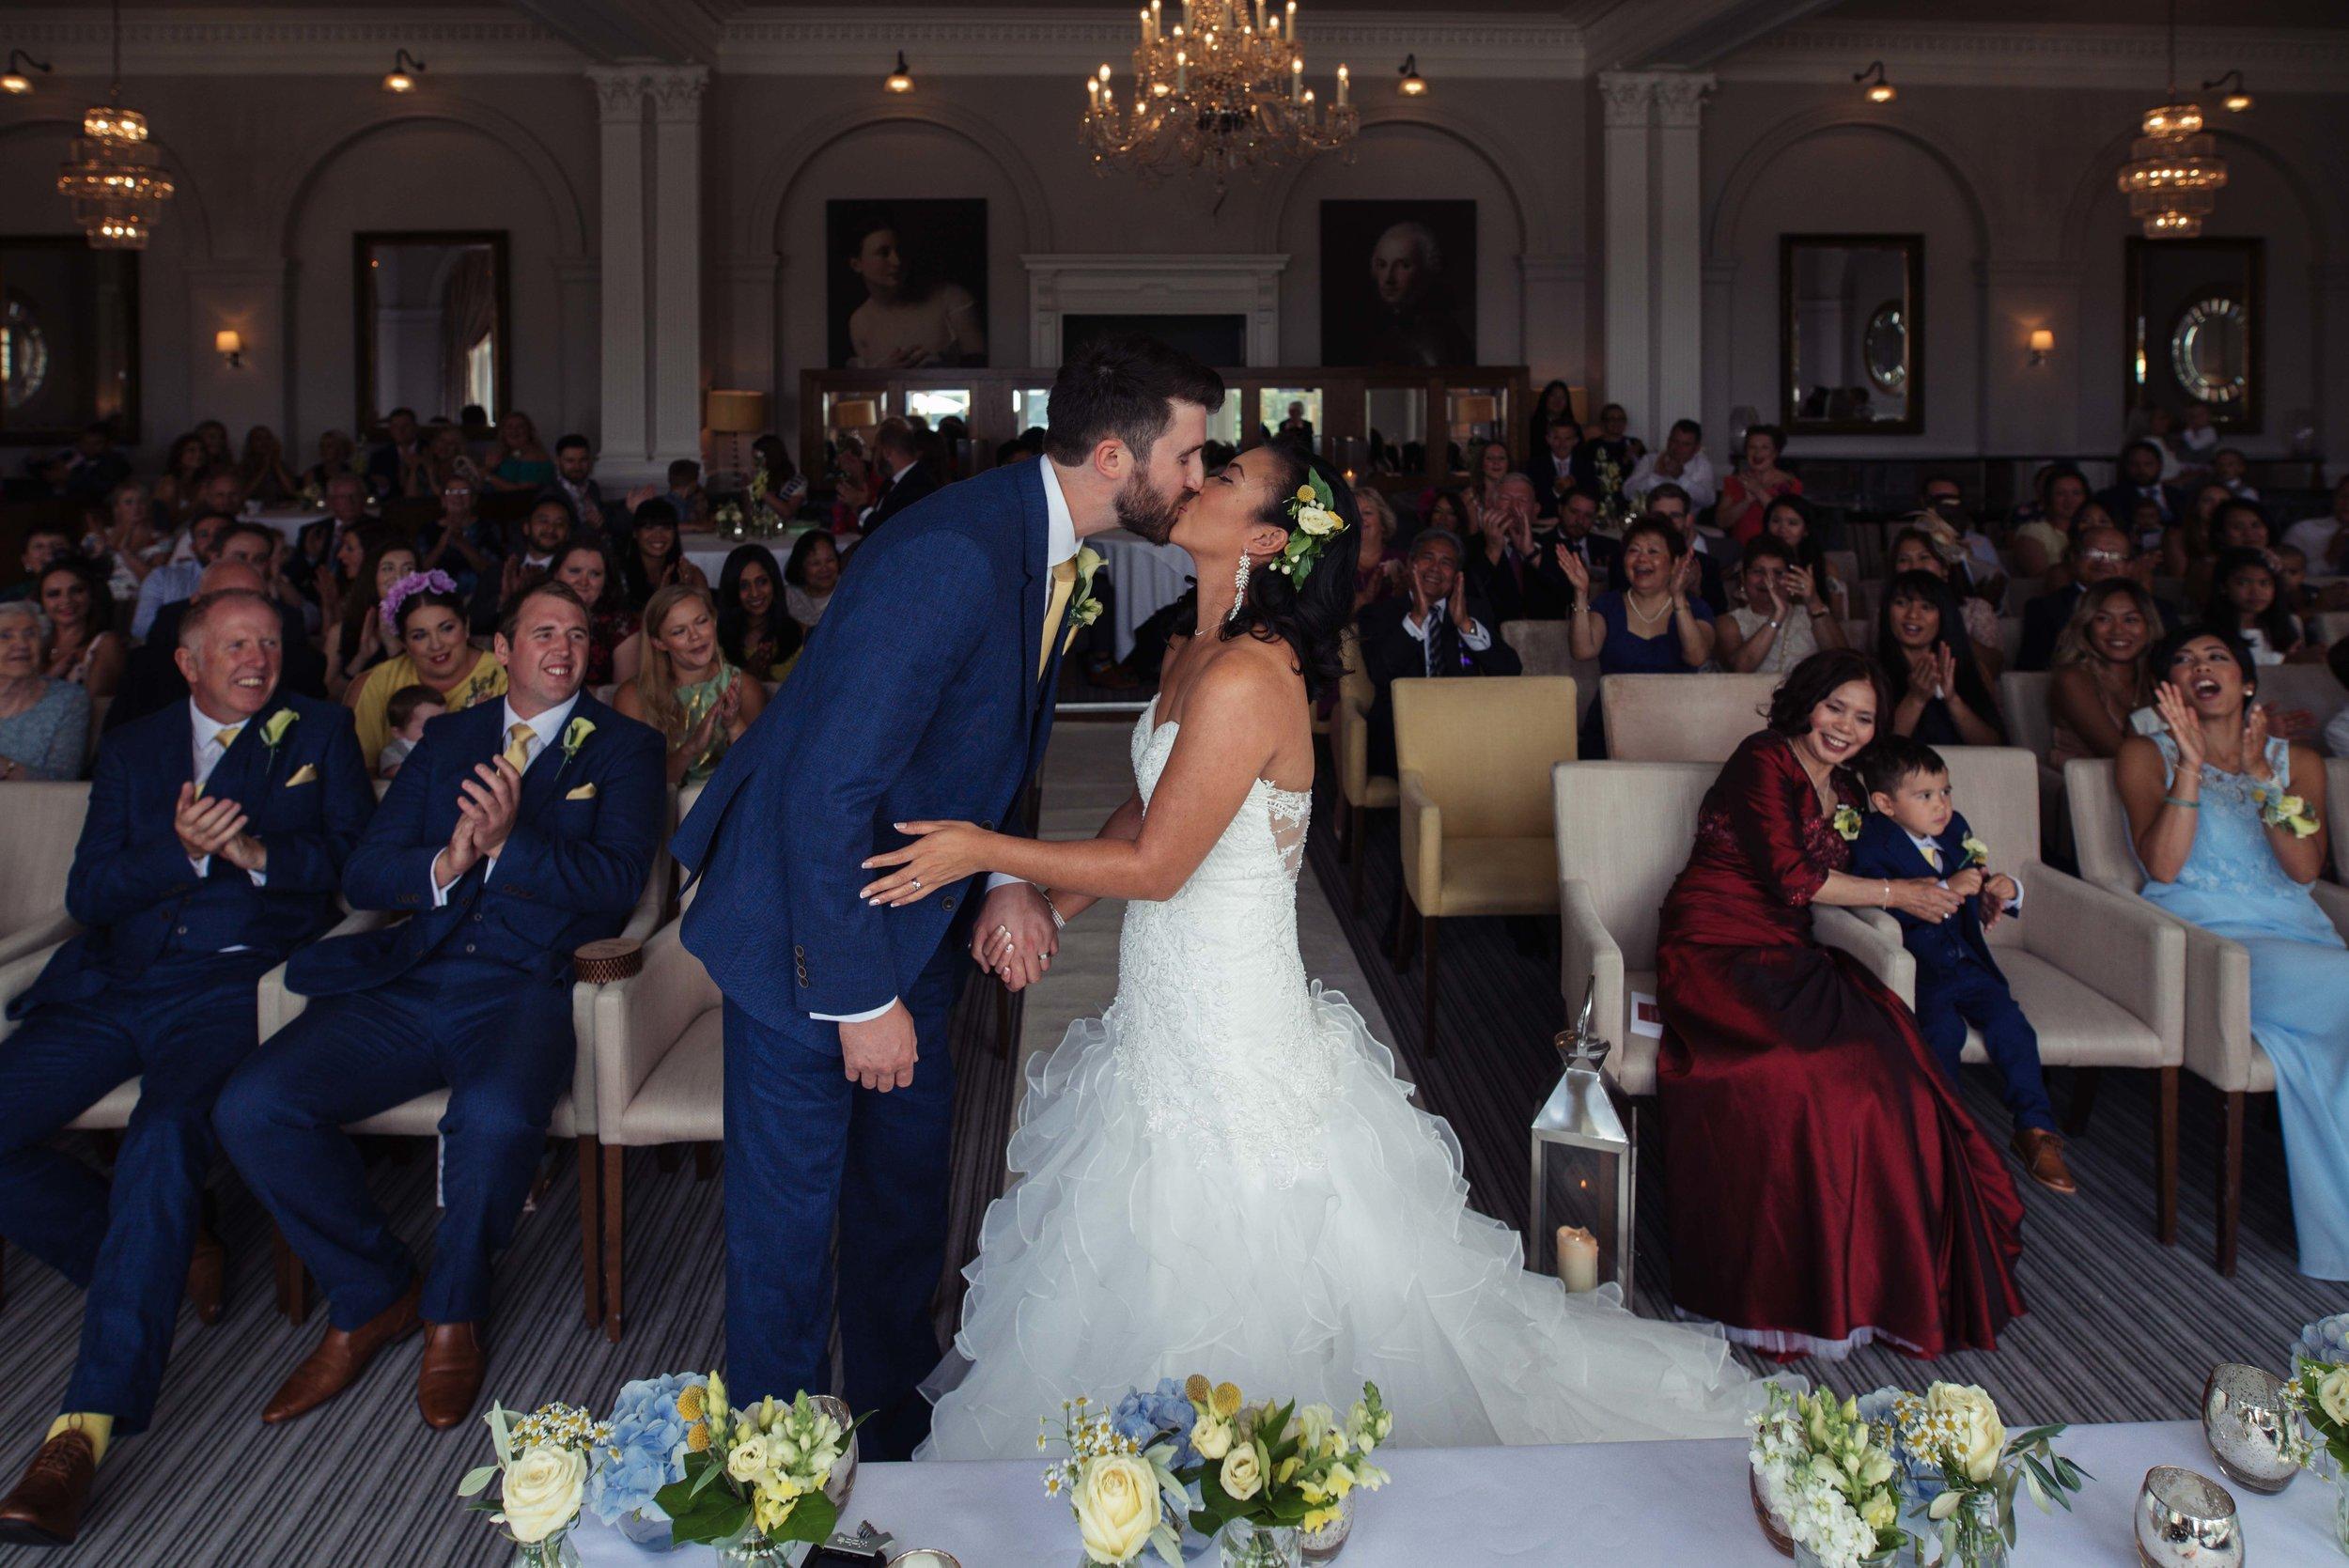 Belsfield Wedding Photography-37.jpg